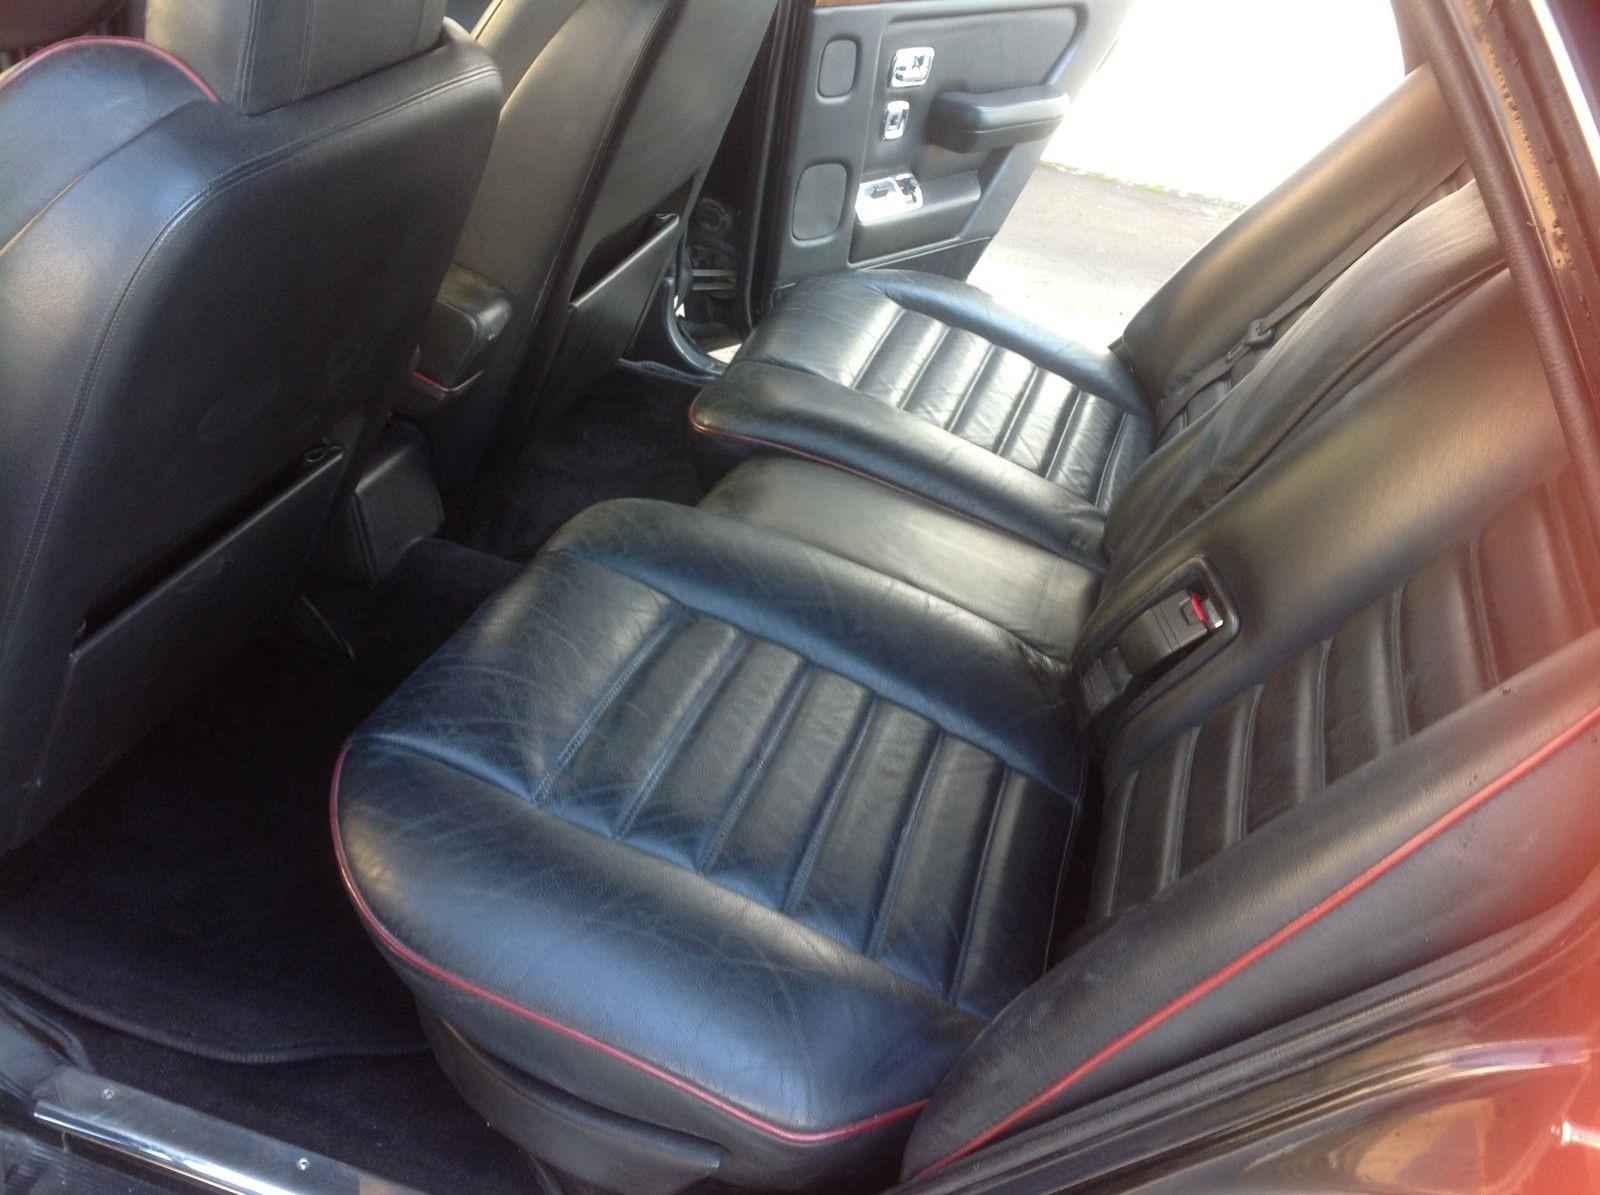 Bentley-Phantom-12%25255B2%25255D.jpg